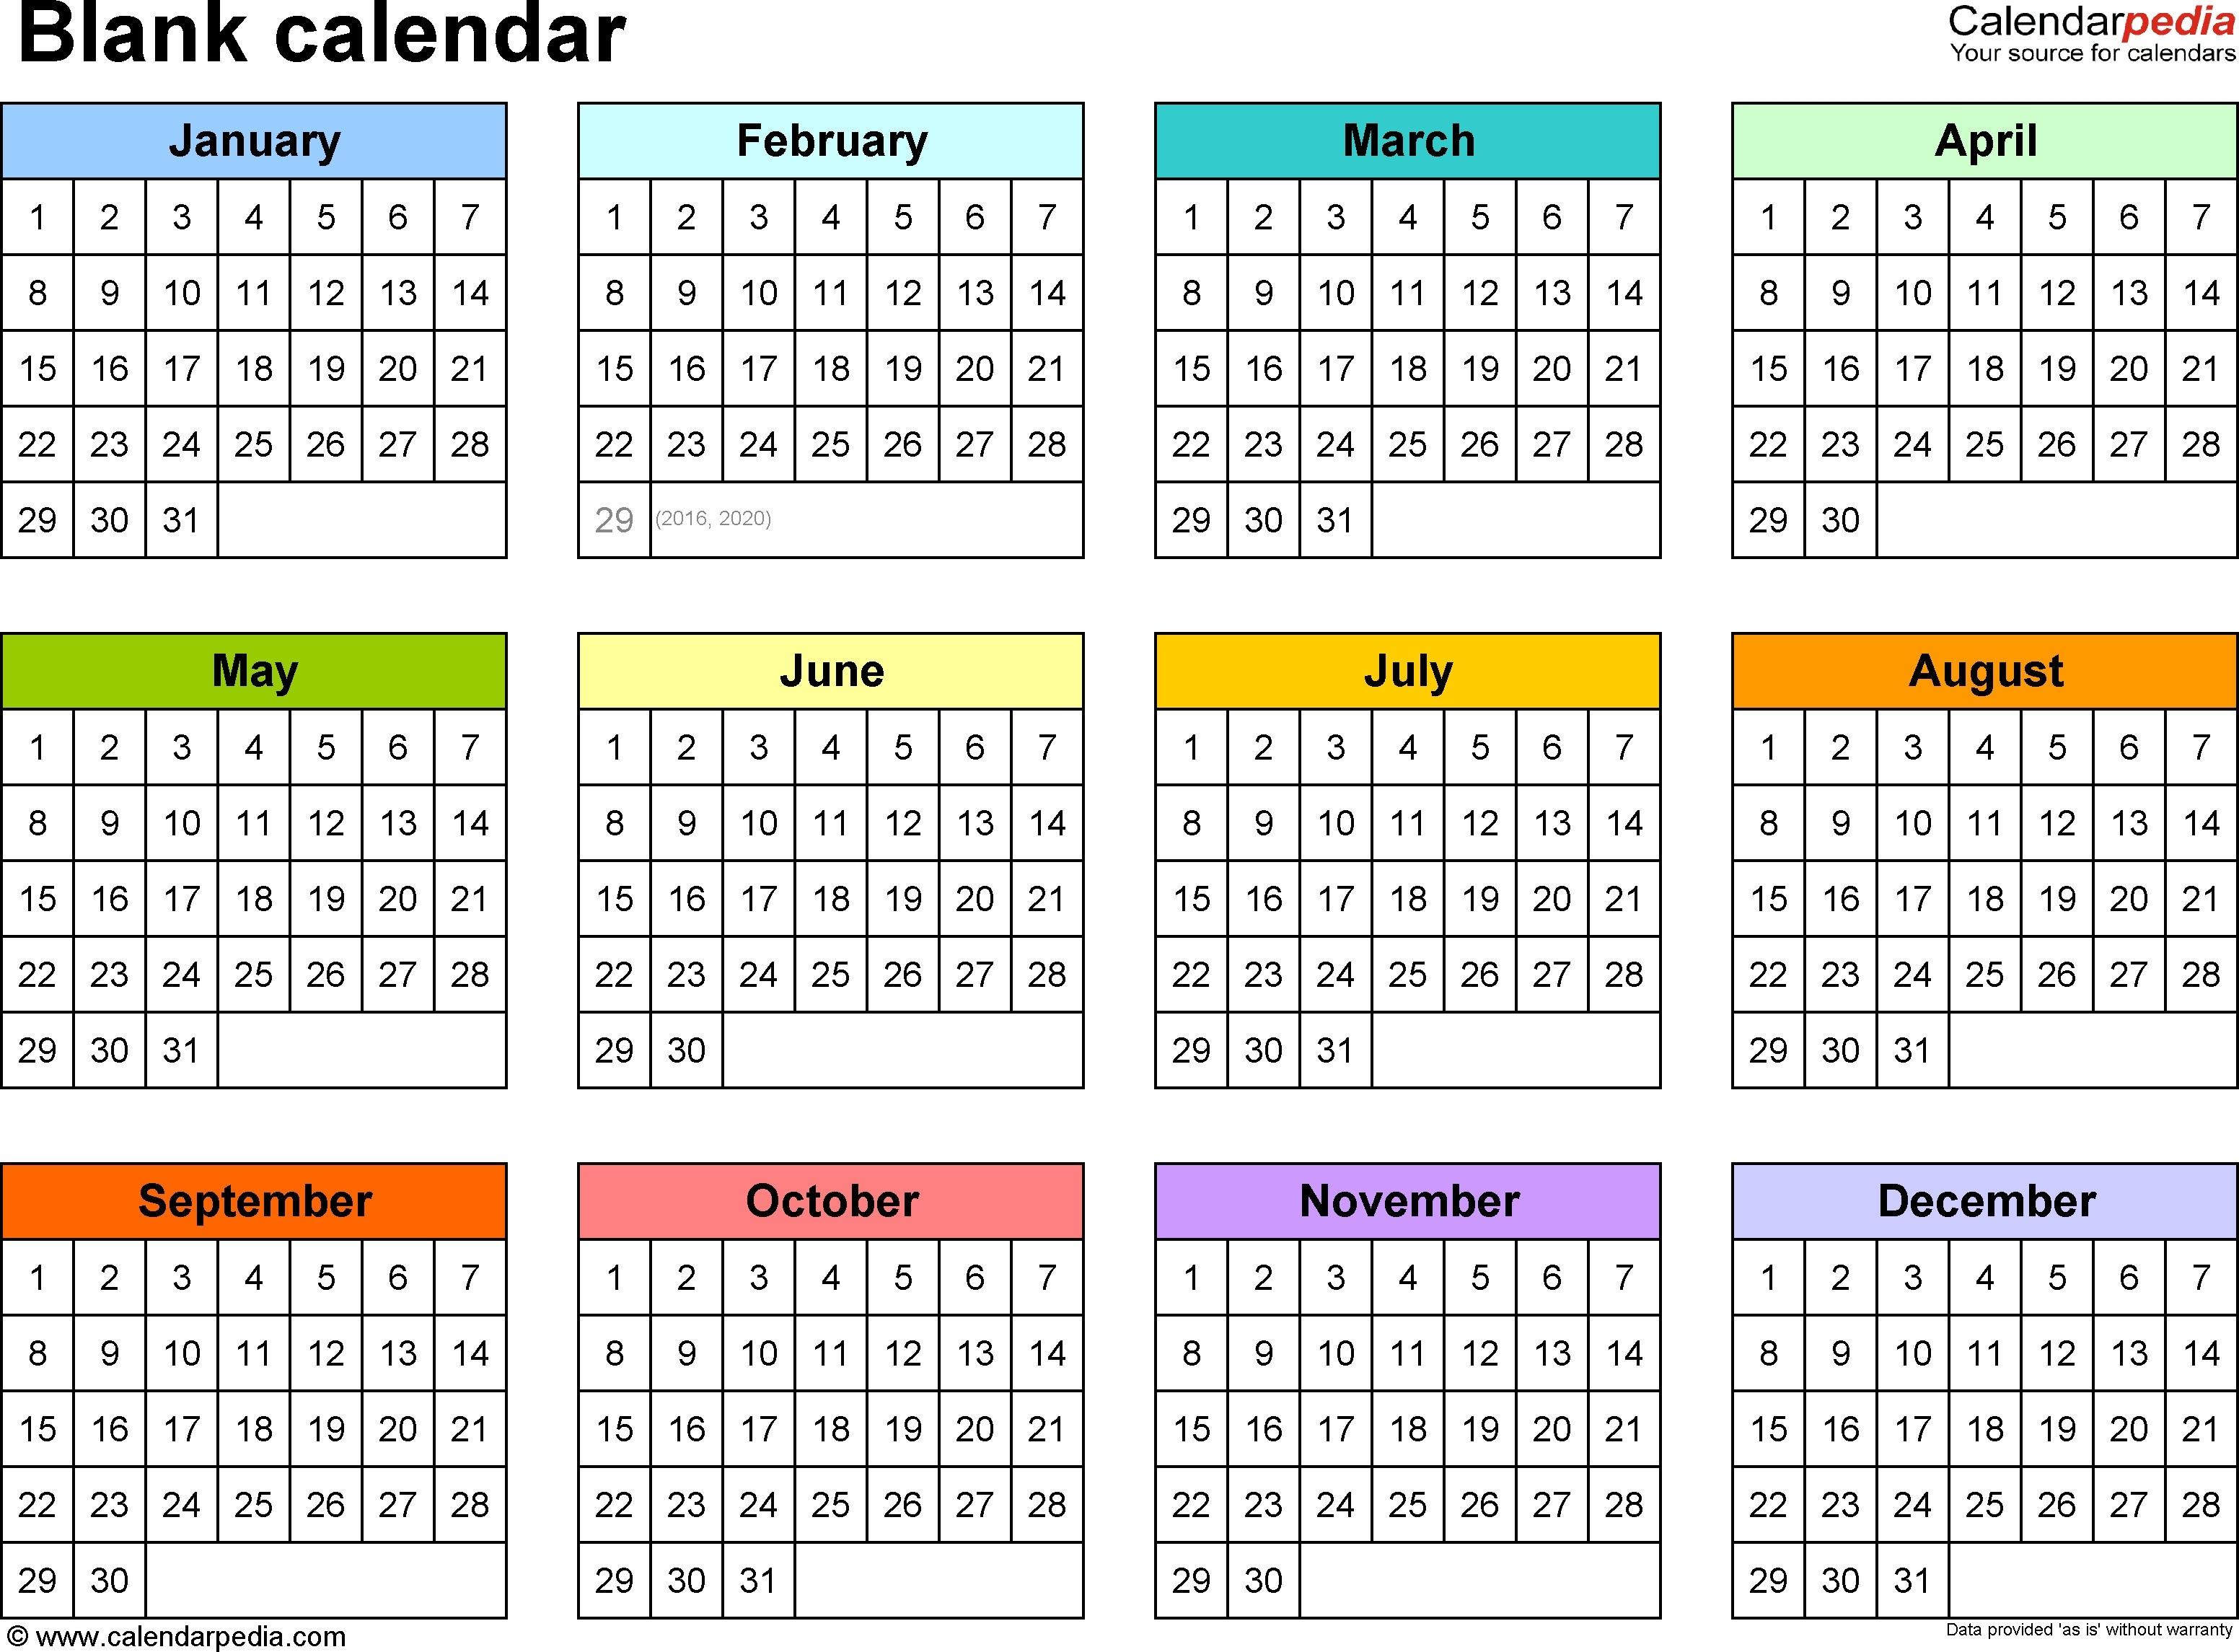 2000 Year Calendar | Vitafitguide  Urdu Calendar Of Year 2000 Month December